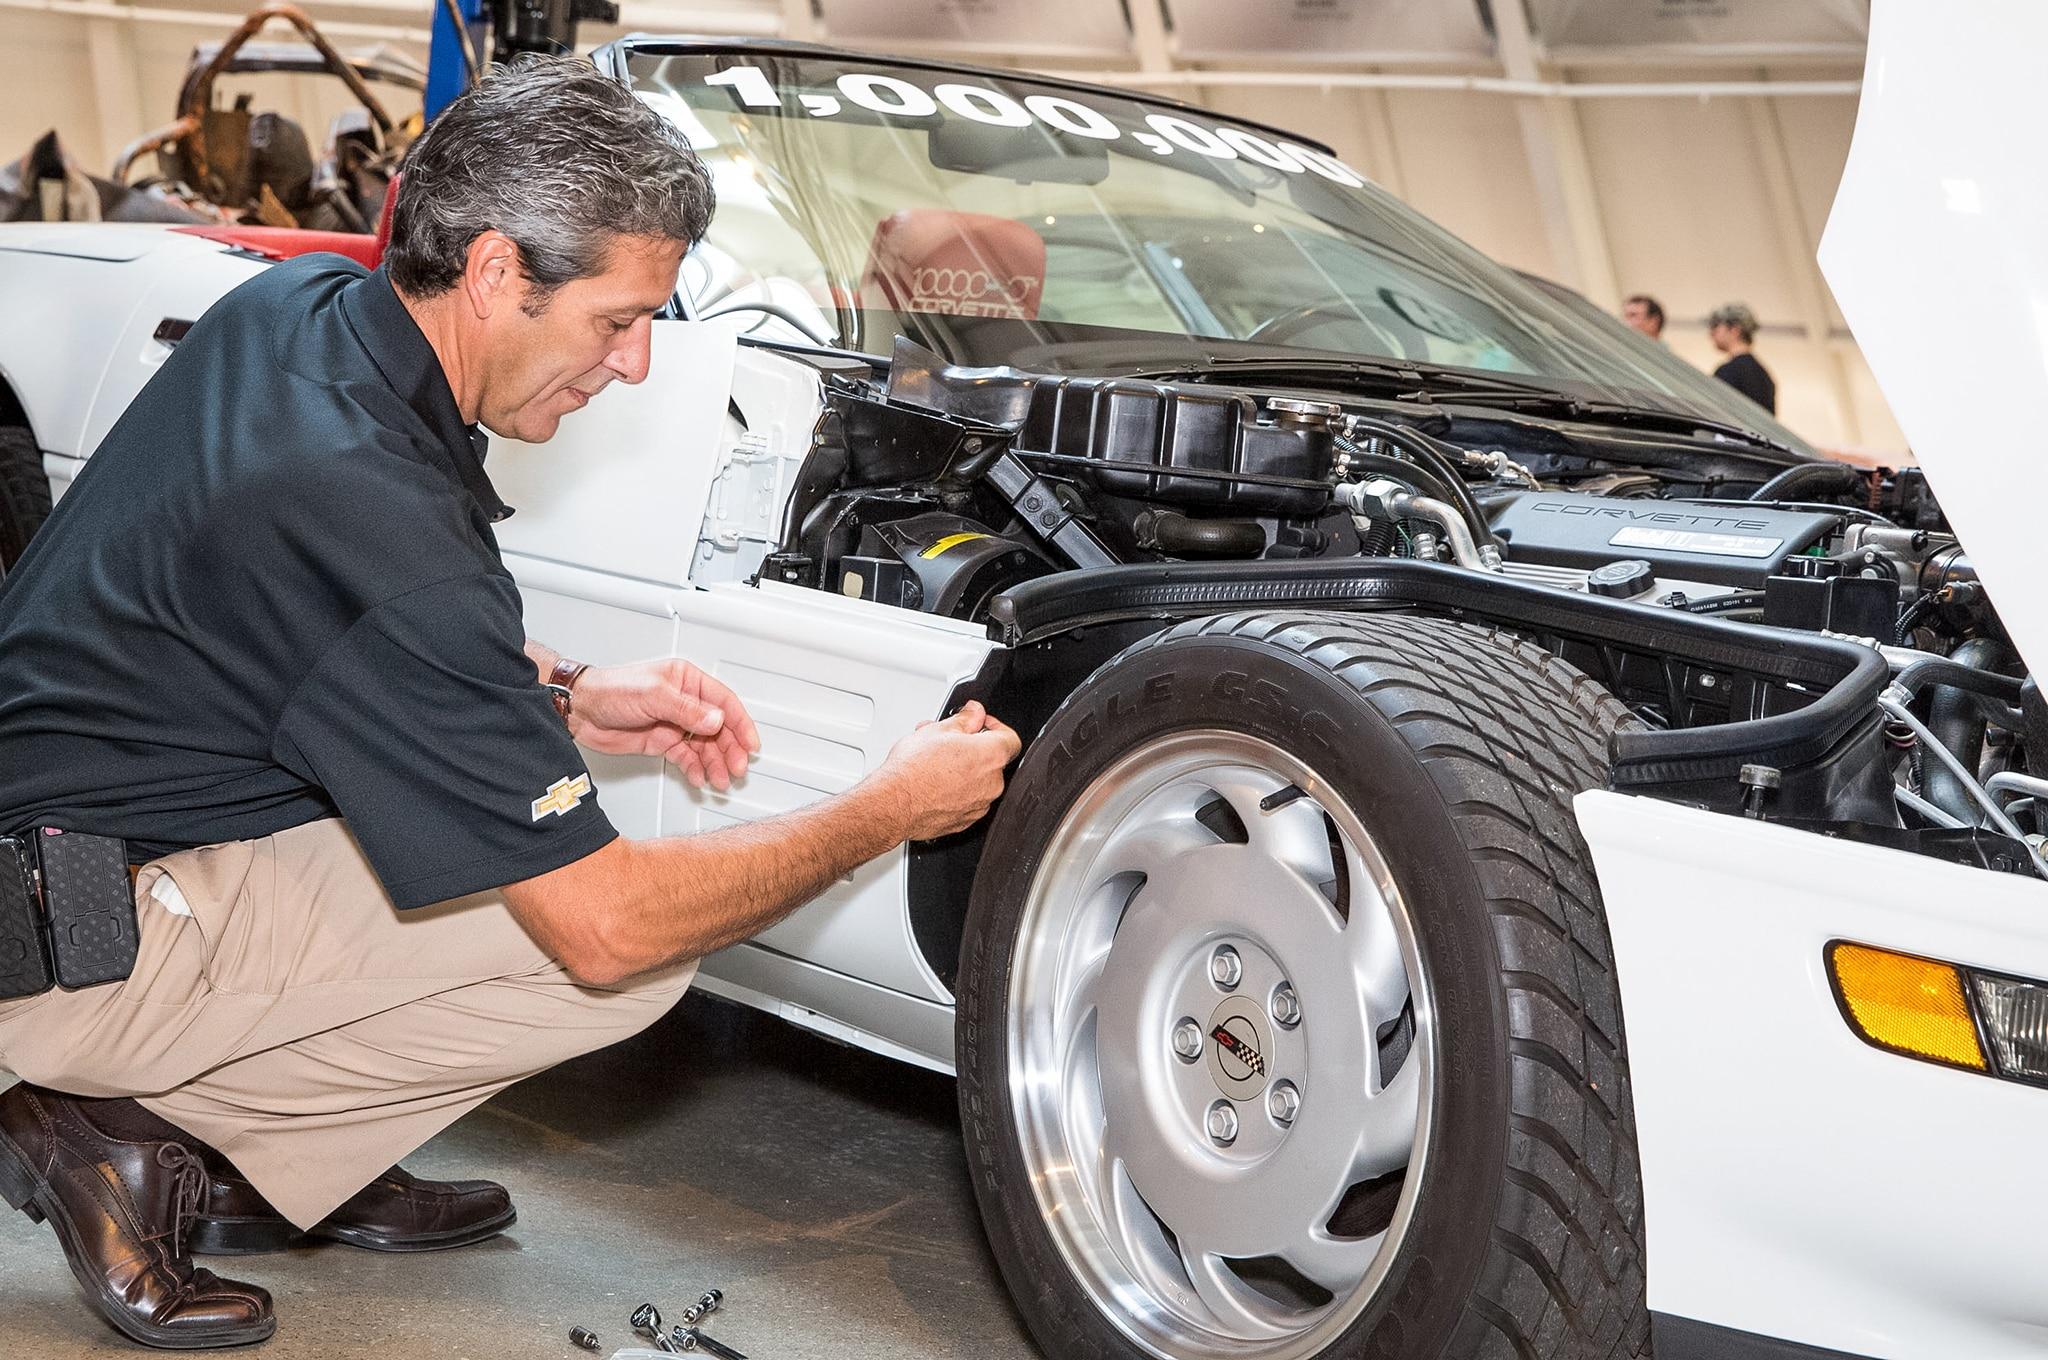 GM Finishes Restoration Of 1992 Chevrolet Corvette Damaged